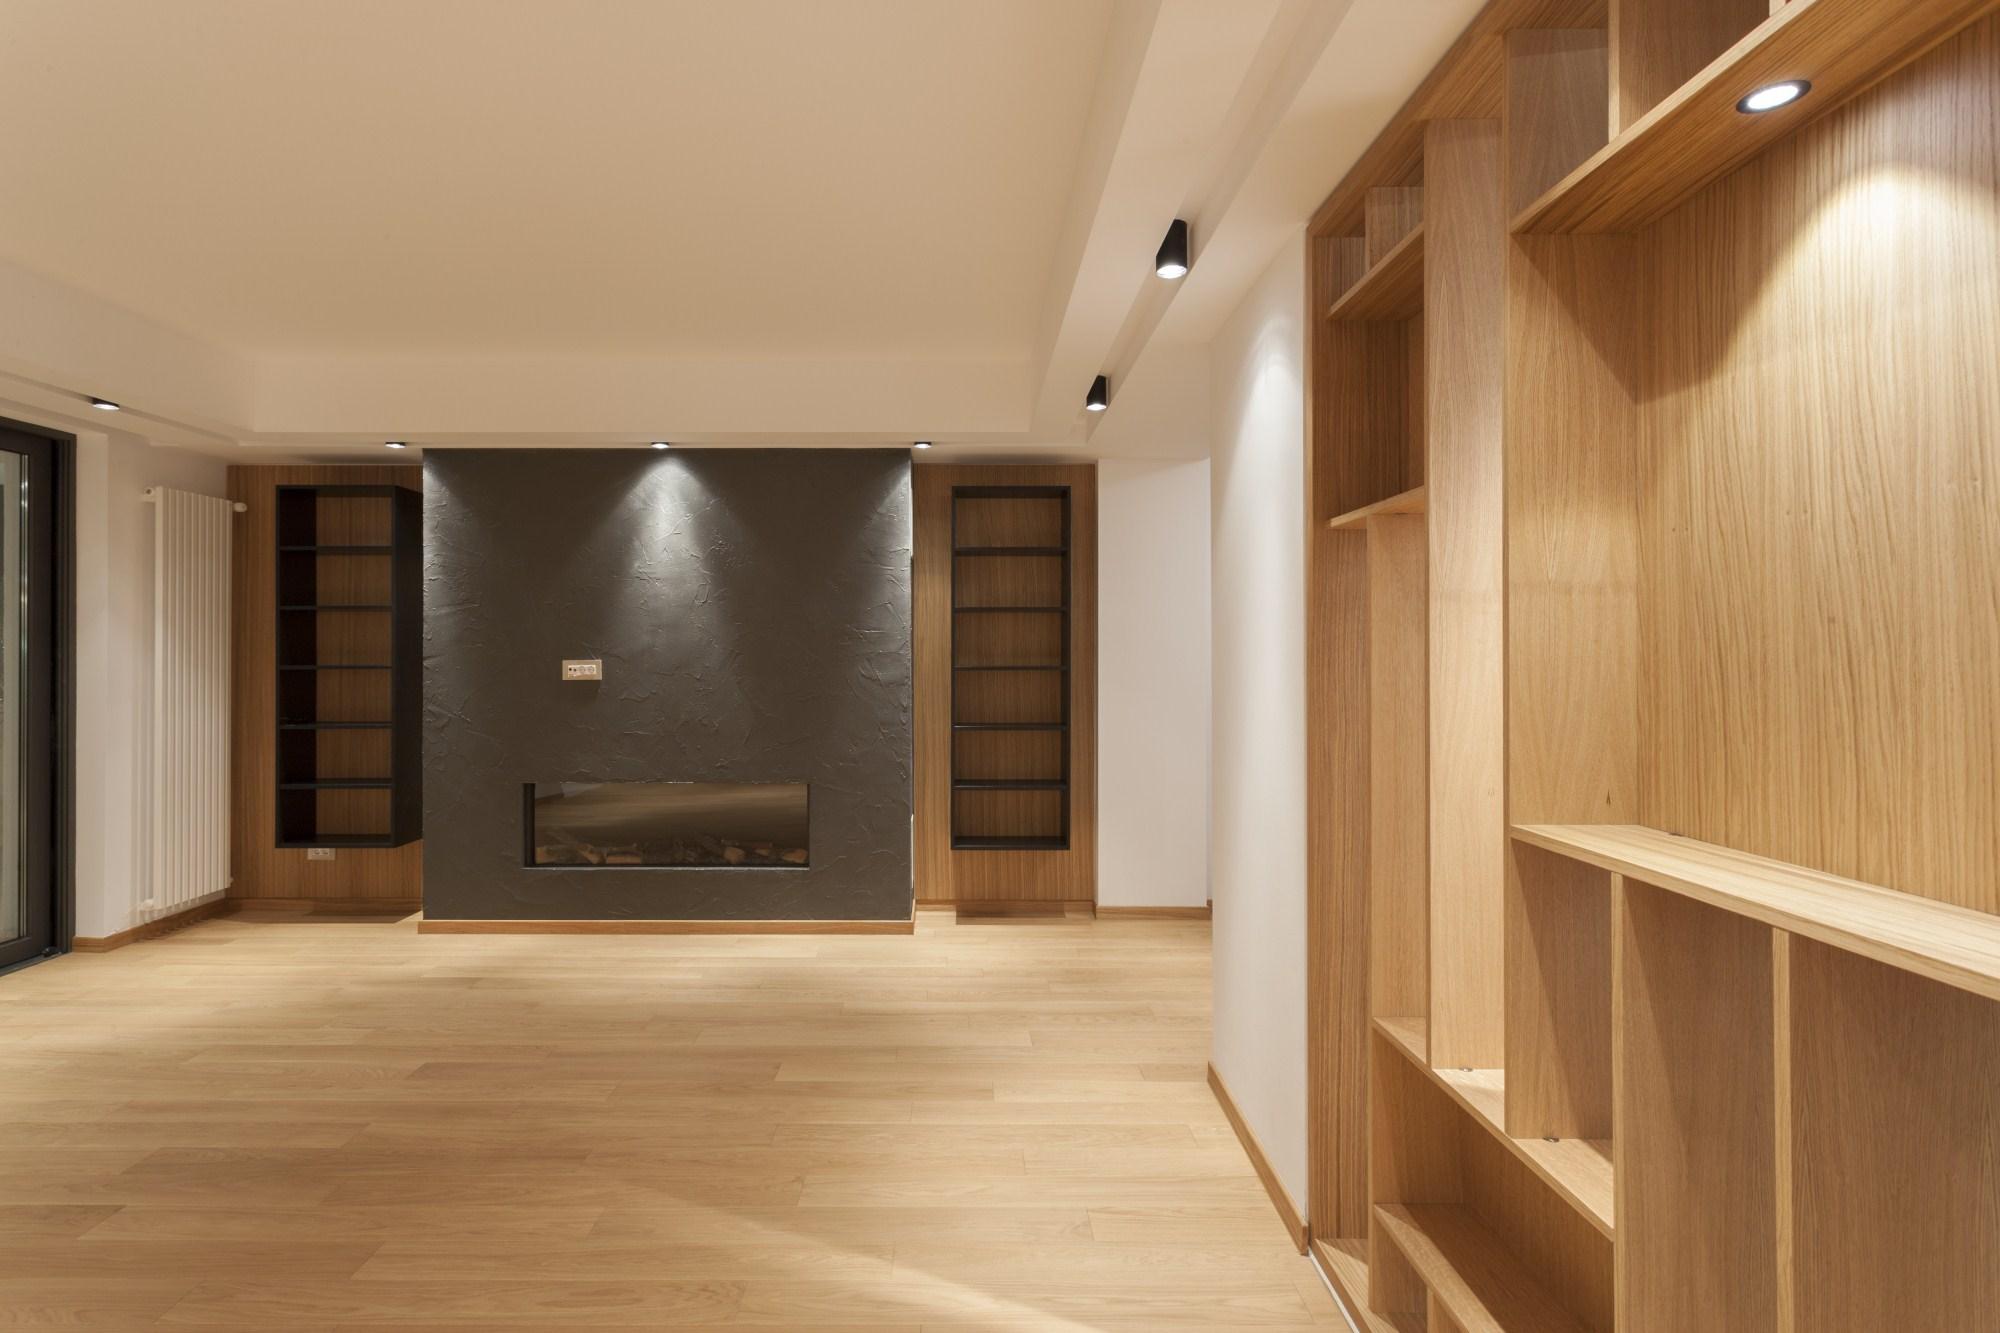 https://nbc-arhitect.ro/wp-content/uploads/2020/10/NBC-Arhitect-_-interiors-_-Vila-Pipera-_-Bucharest-Romania-_-interior-design-view_15.jpg